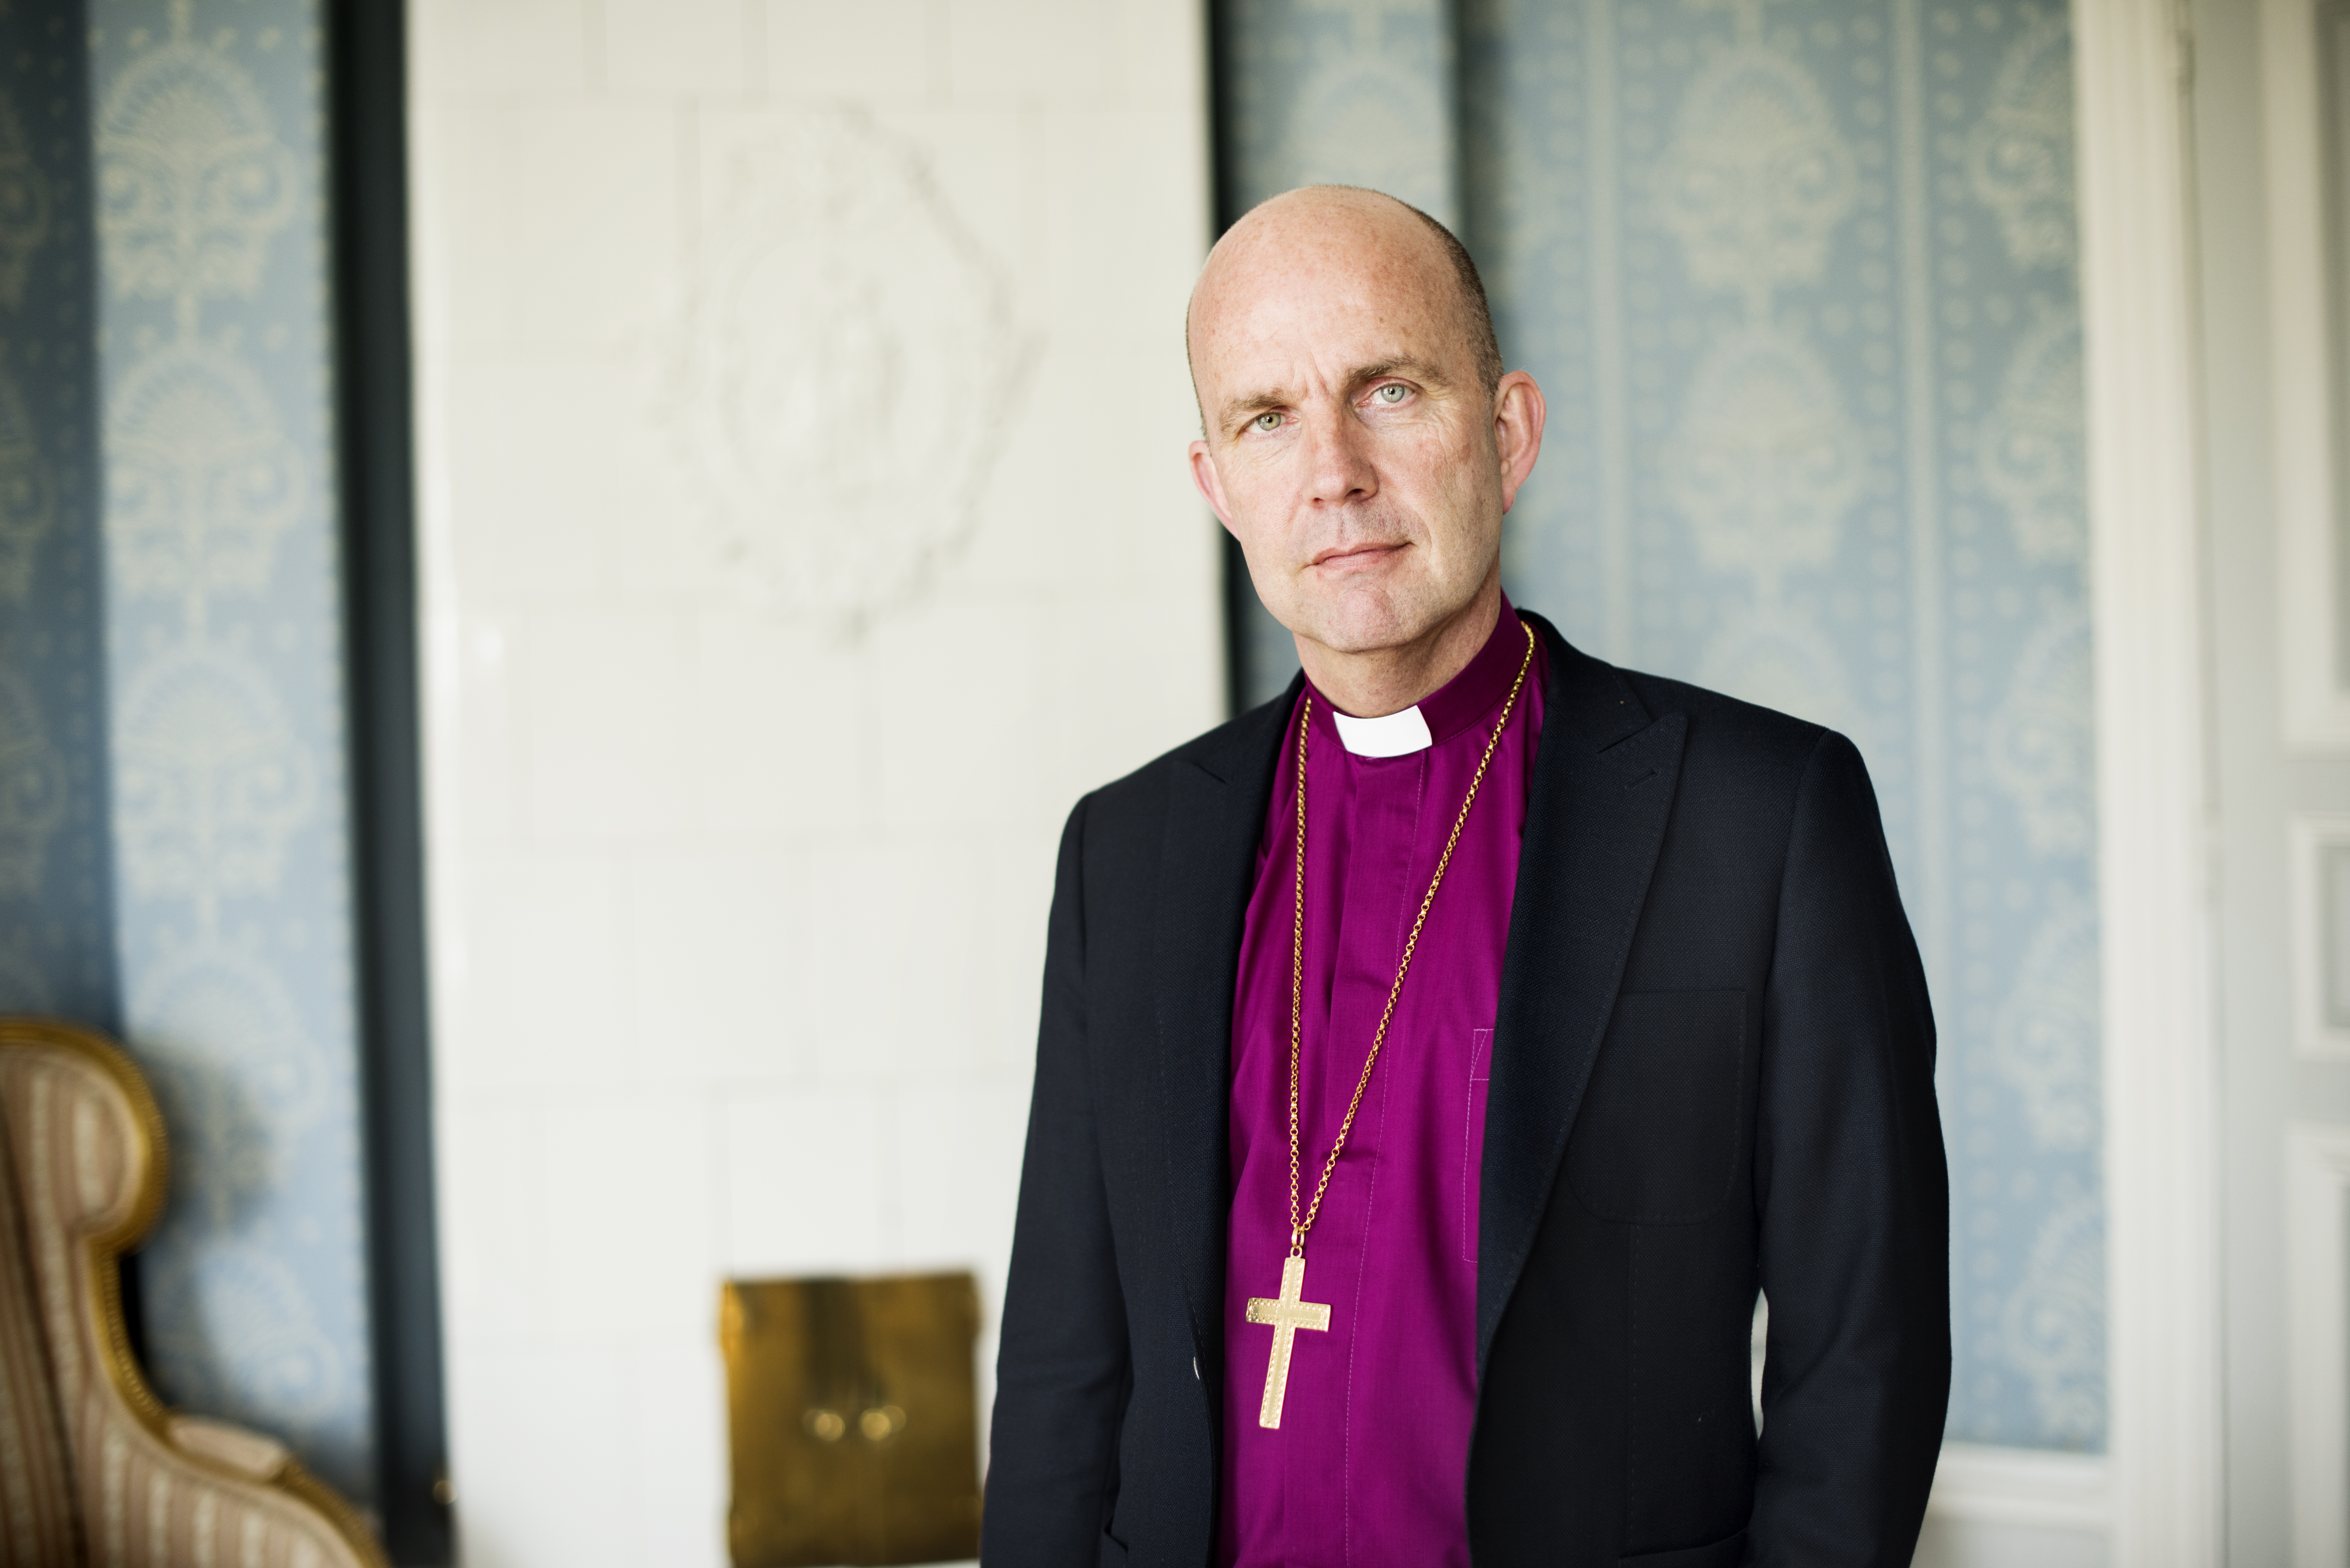 Fredrik modeus ny biskop i vaxjo